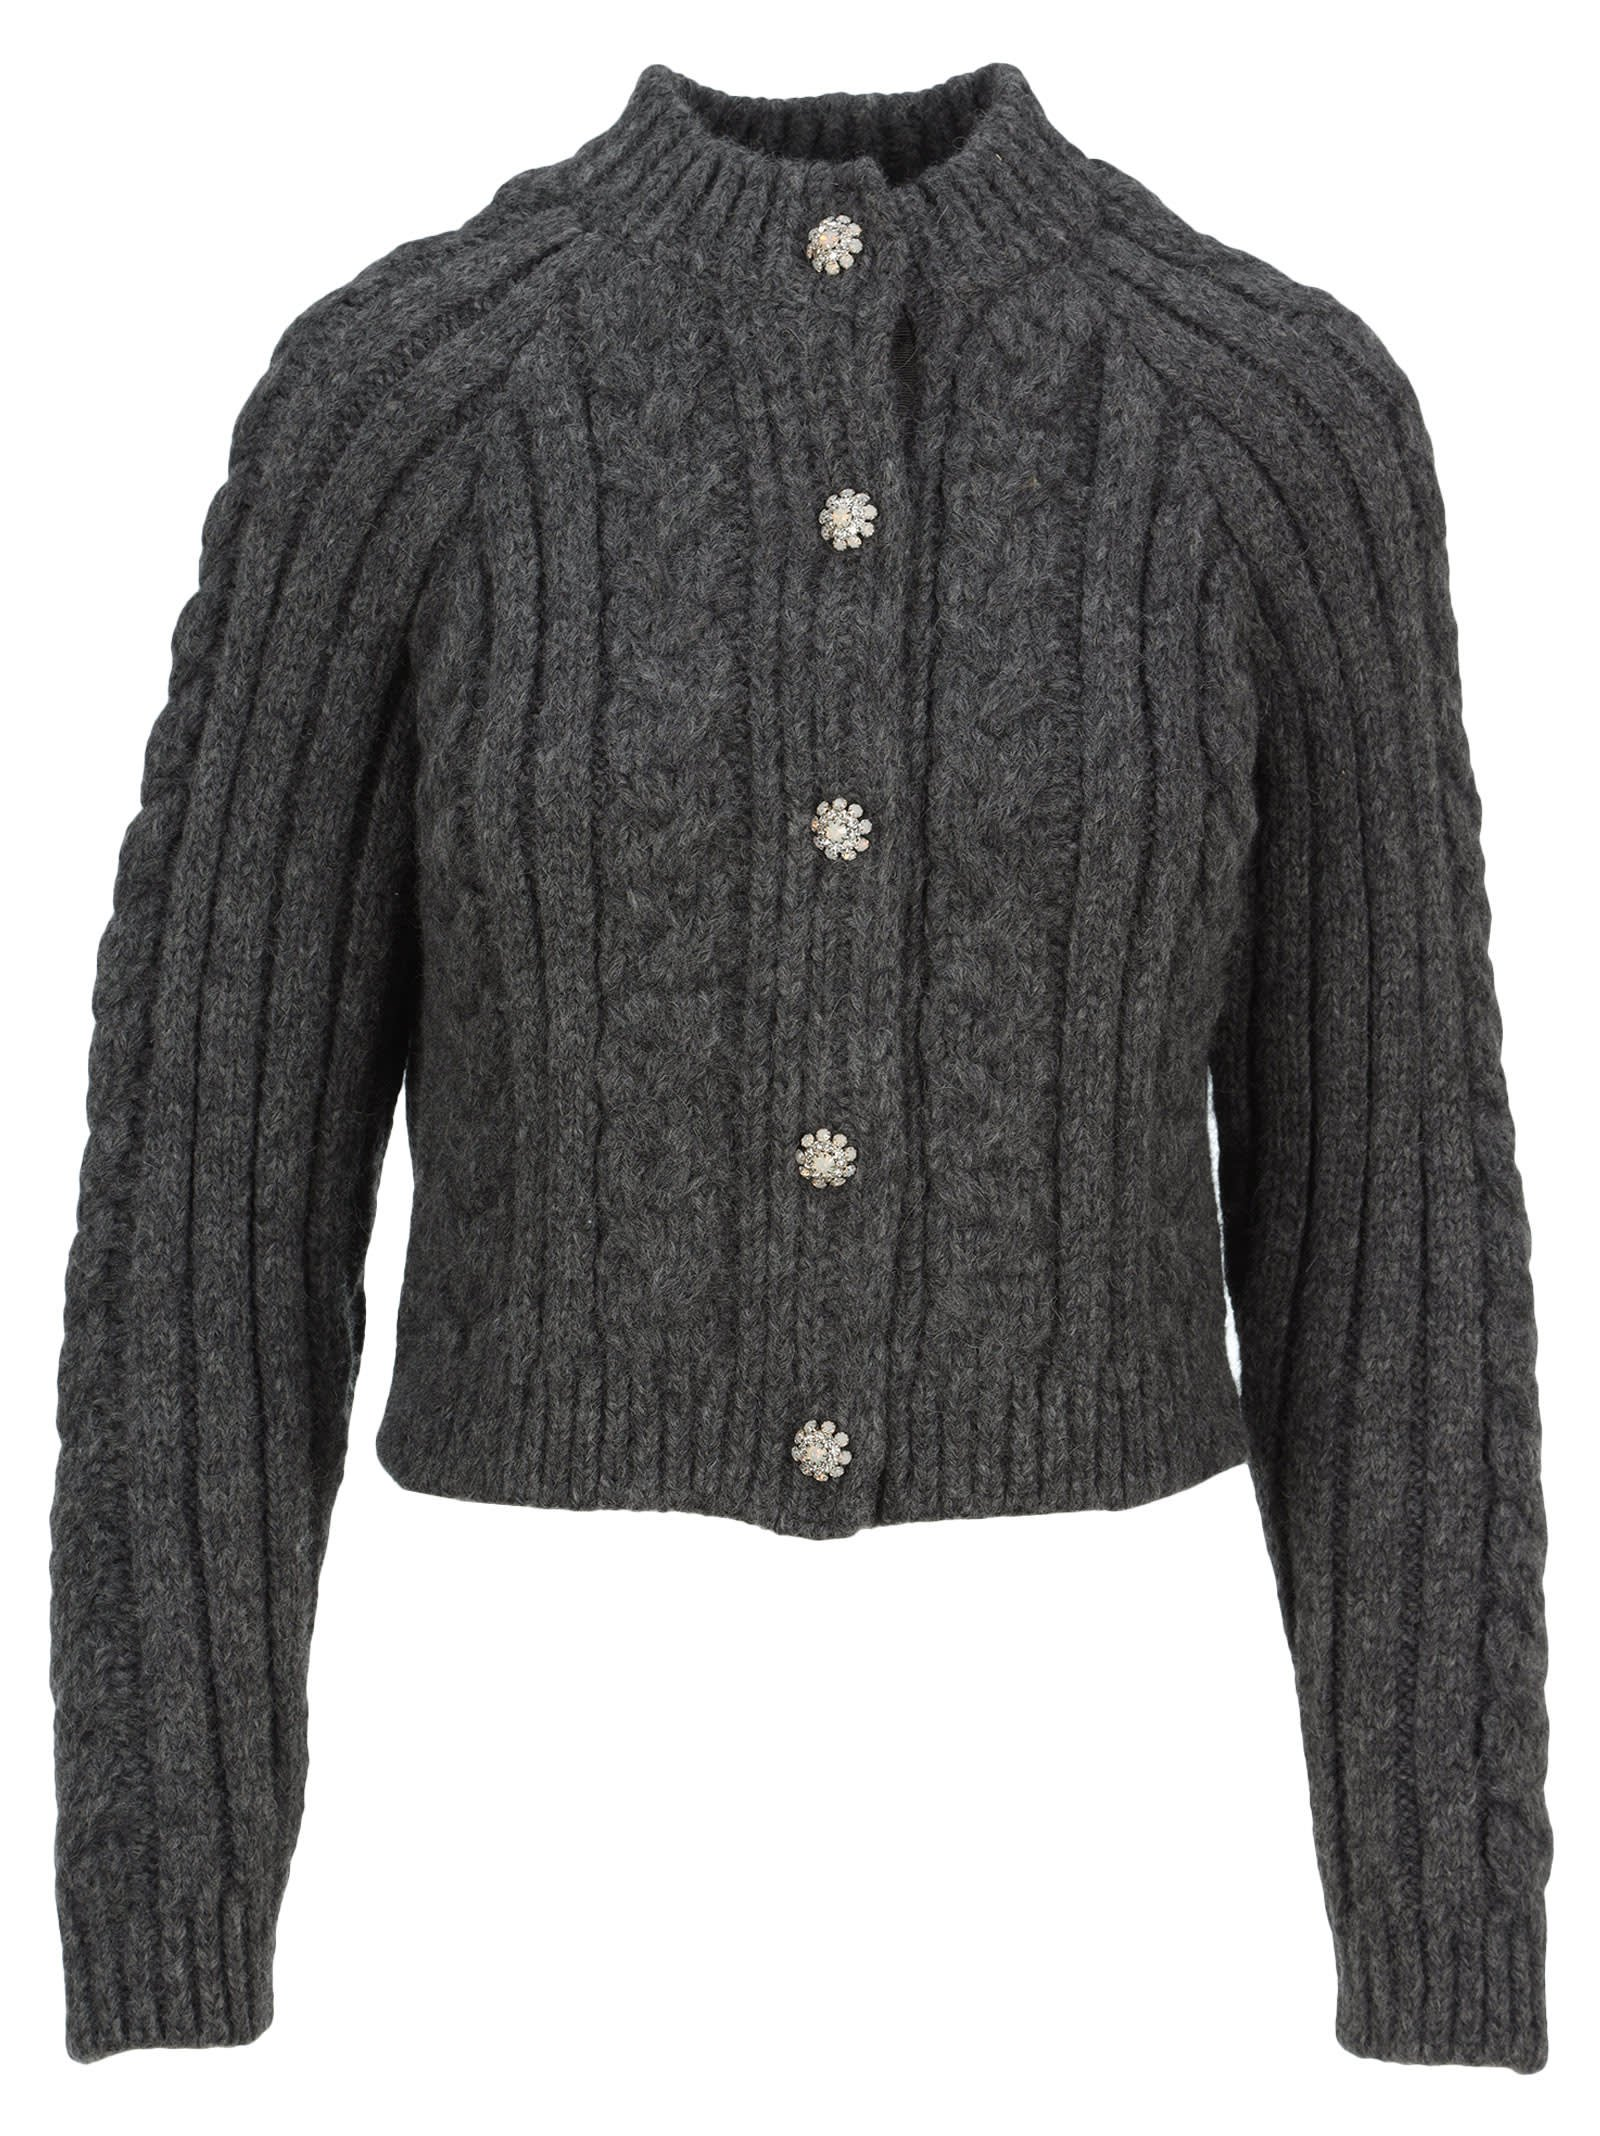 Ganni Cable Knit Cardigan